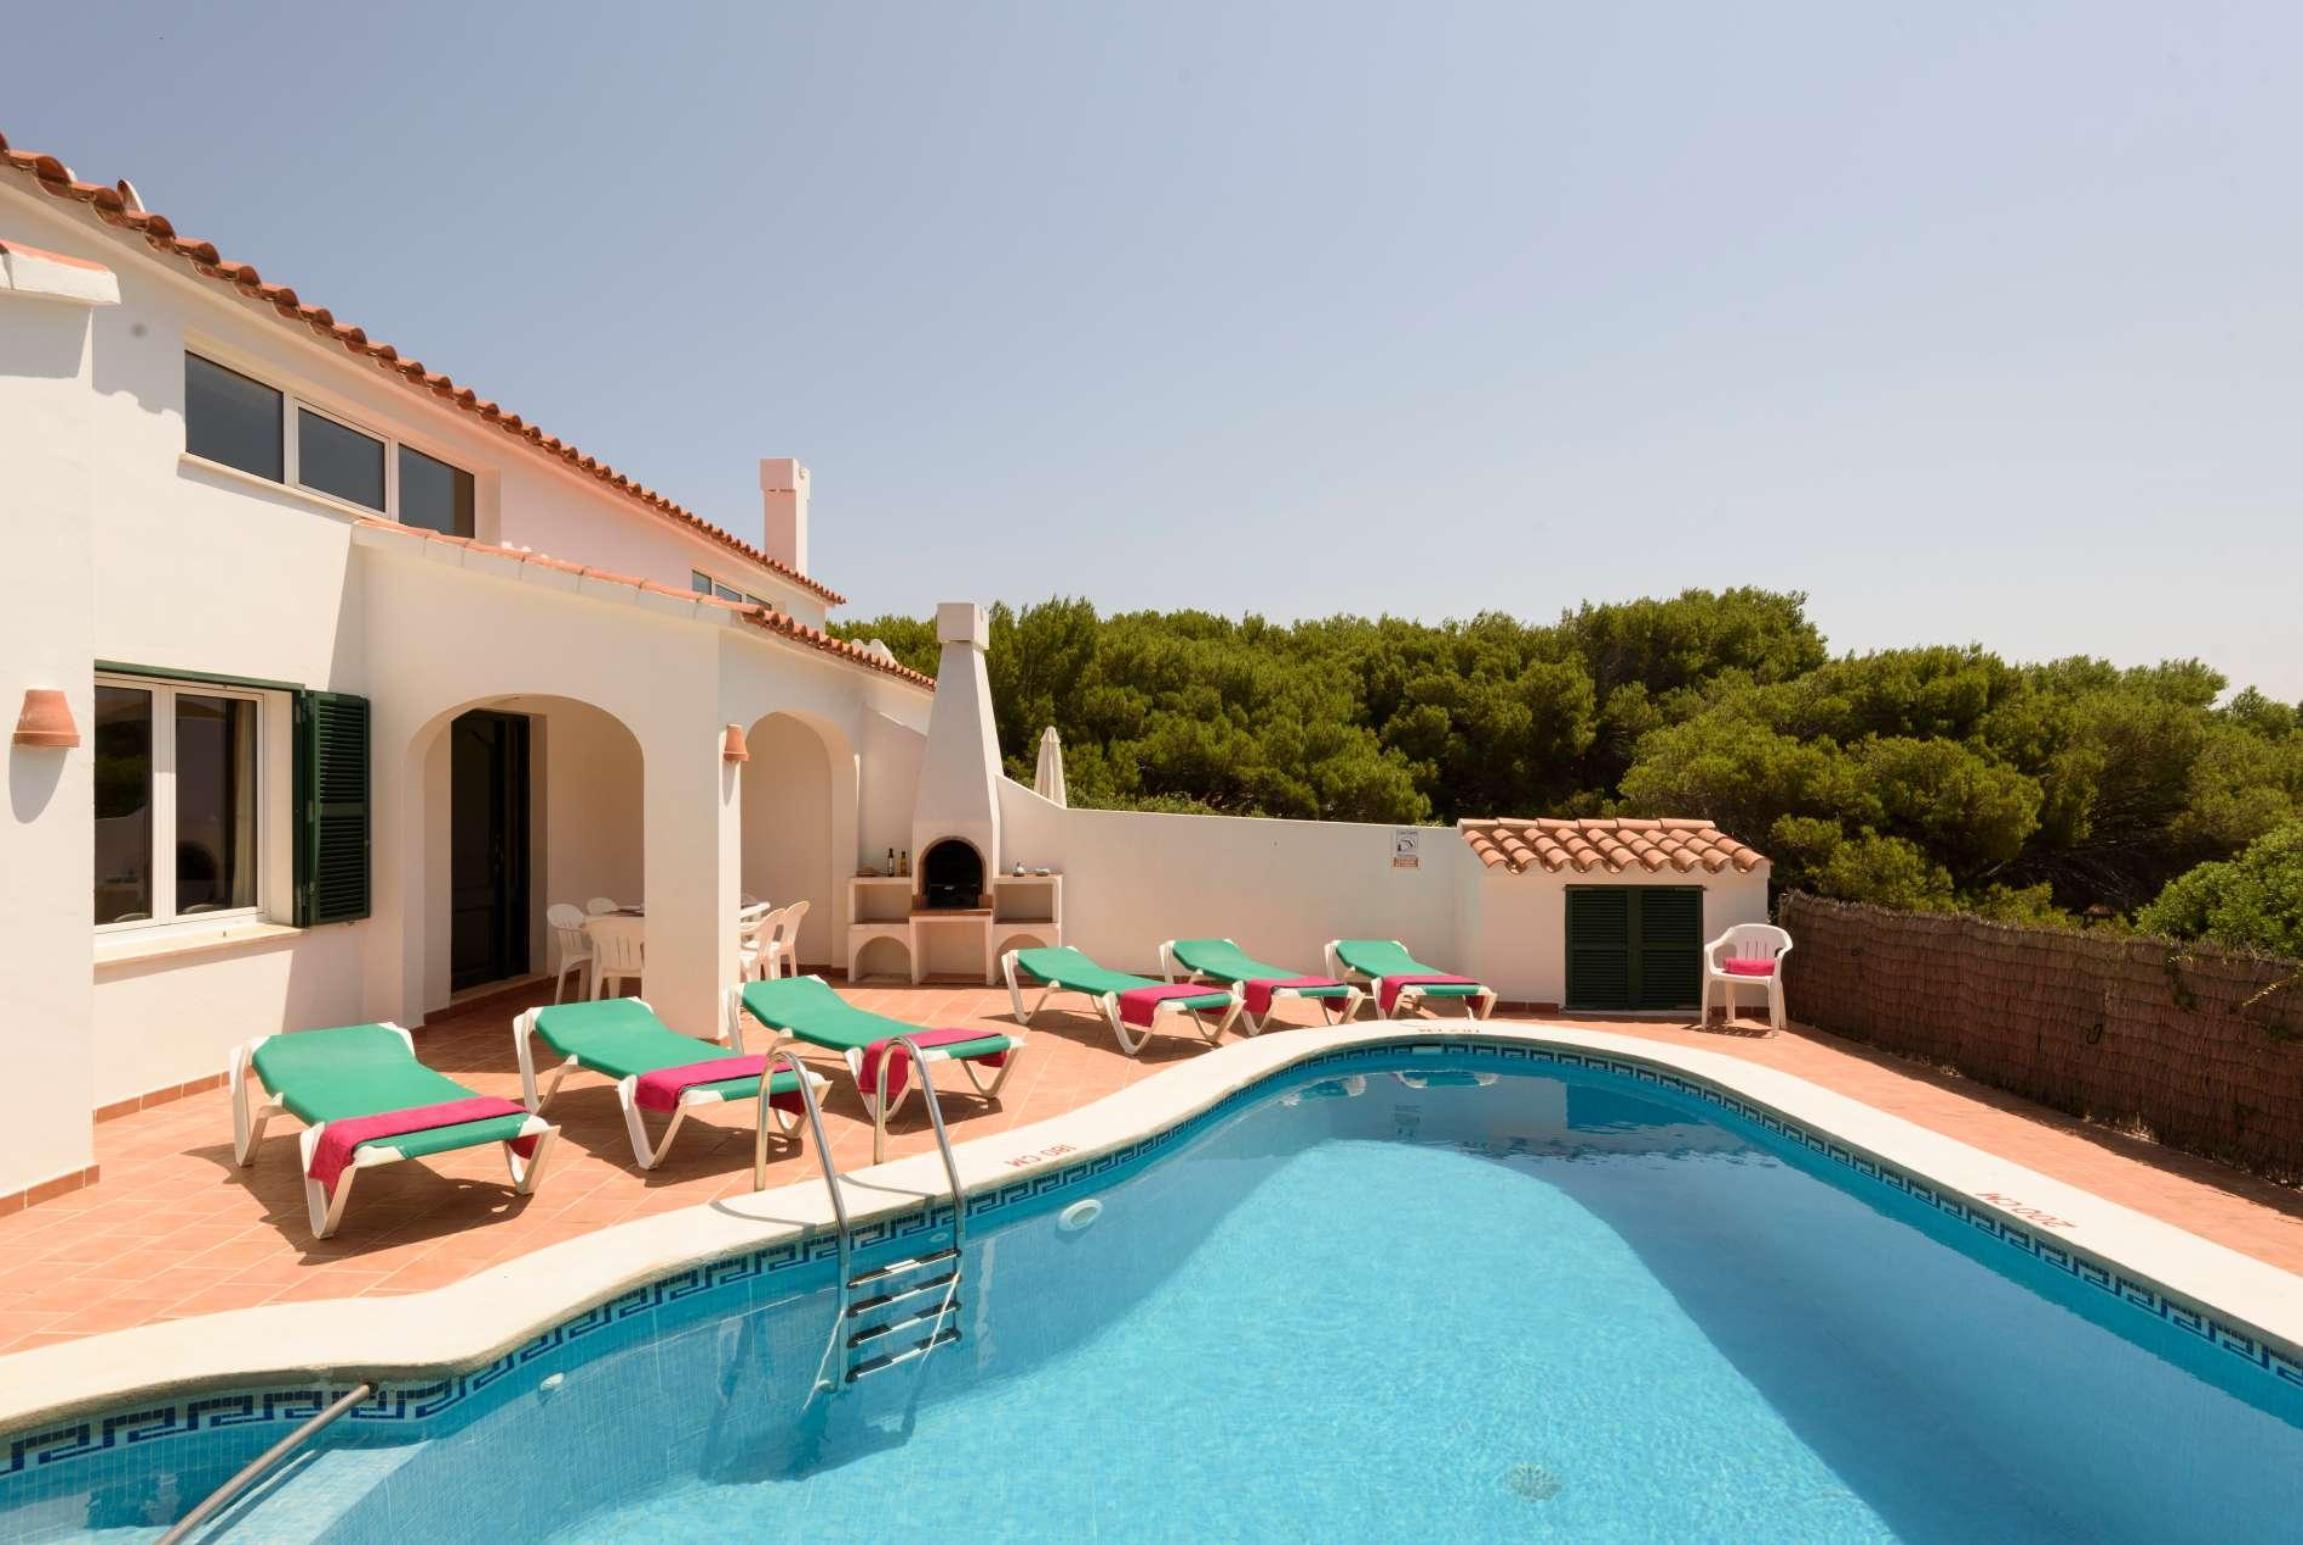 Ferienhaus Eulalia II (2653368), Arenal De'N Castell, Menorca, Balearische Inseln, Spanien, Bild 22